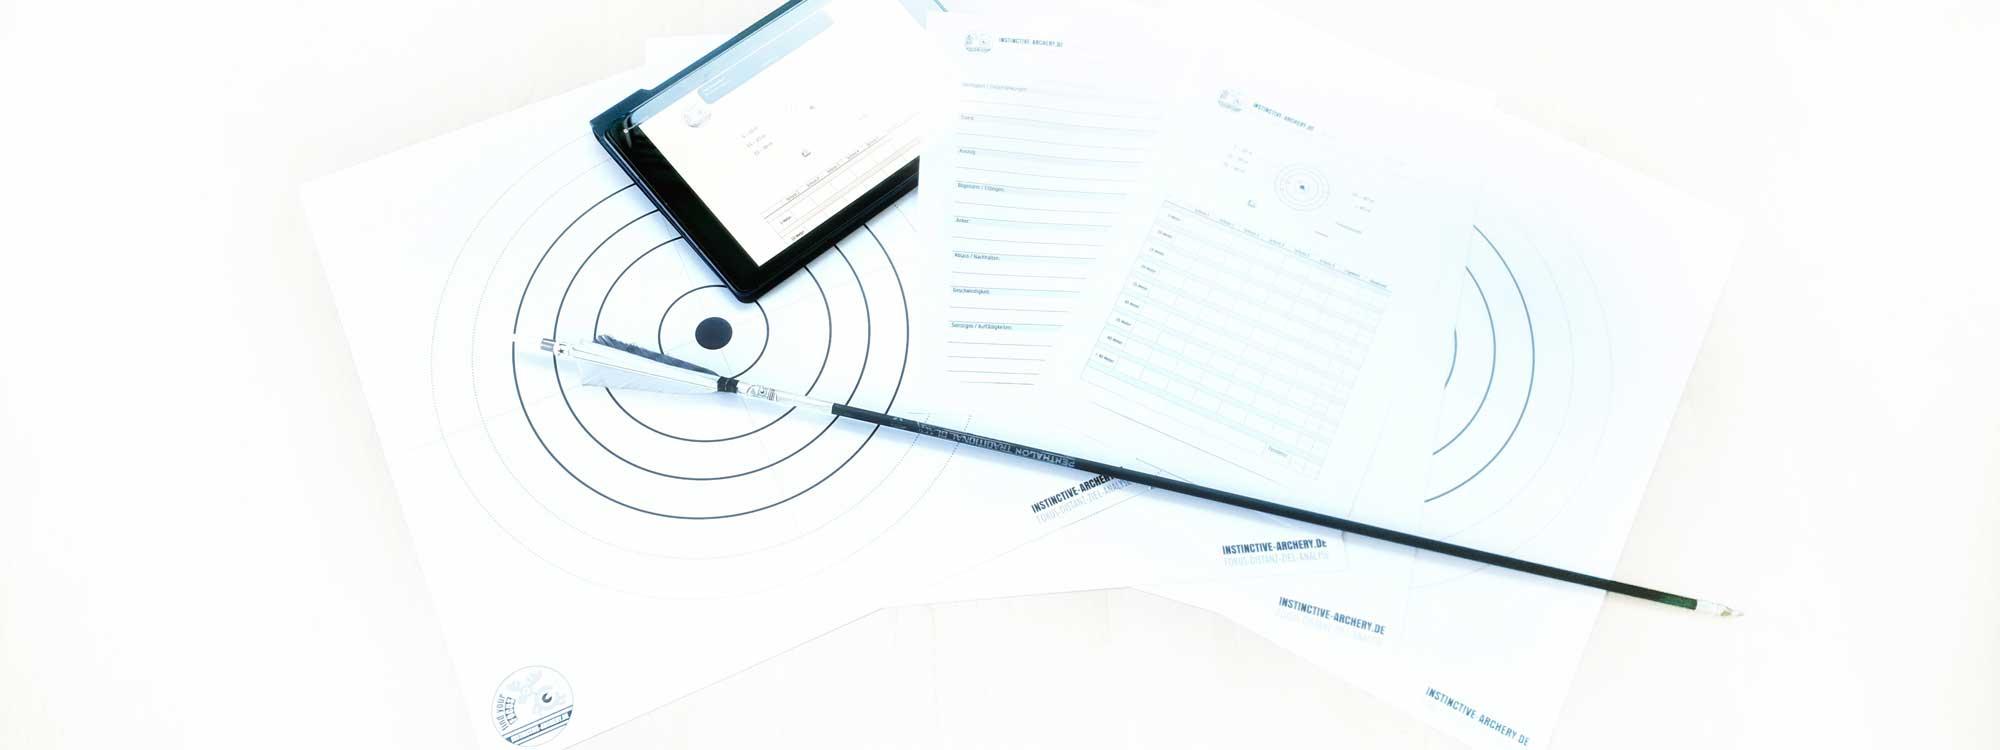 Fokus-Distanz-Ziel-Analyse